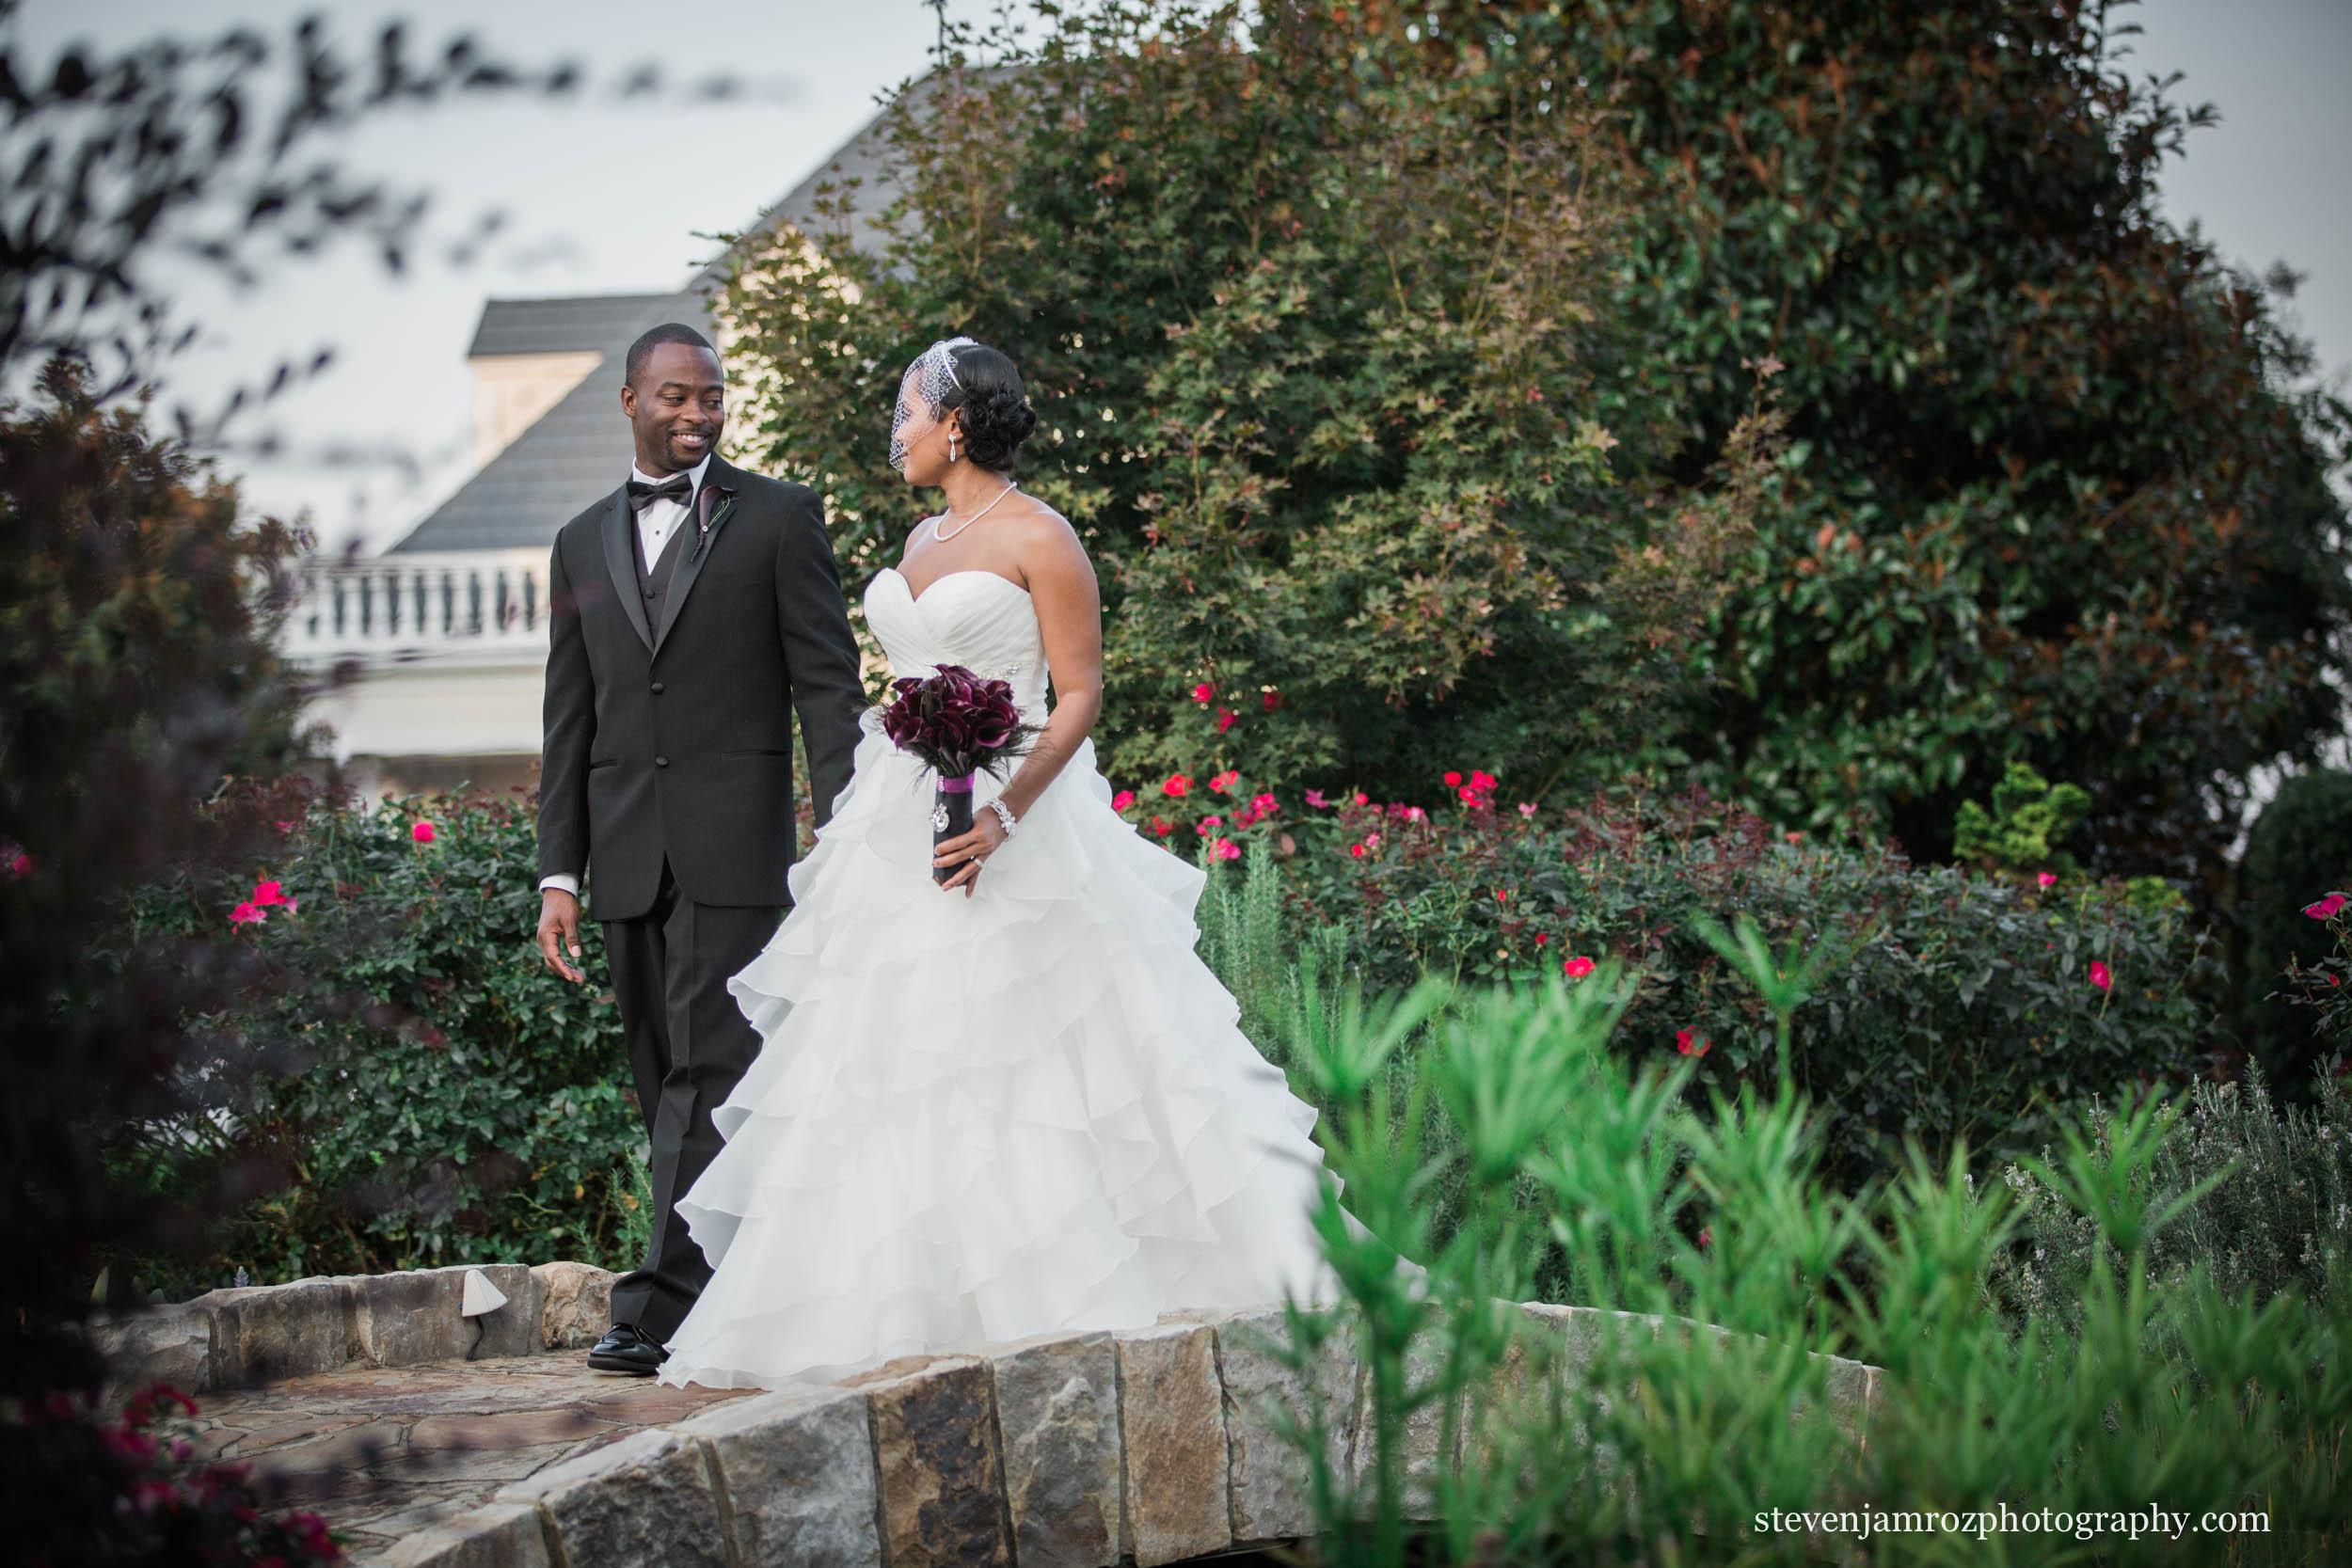 landmark-garner-nc-wedding-photographer-steven-jamroz-photography-0417.jpg